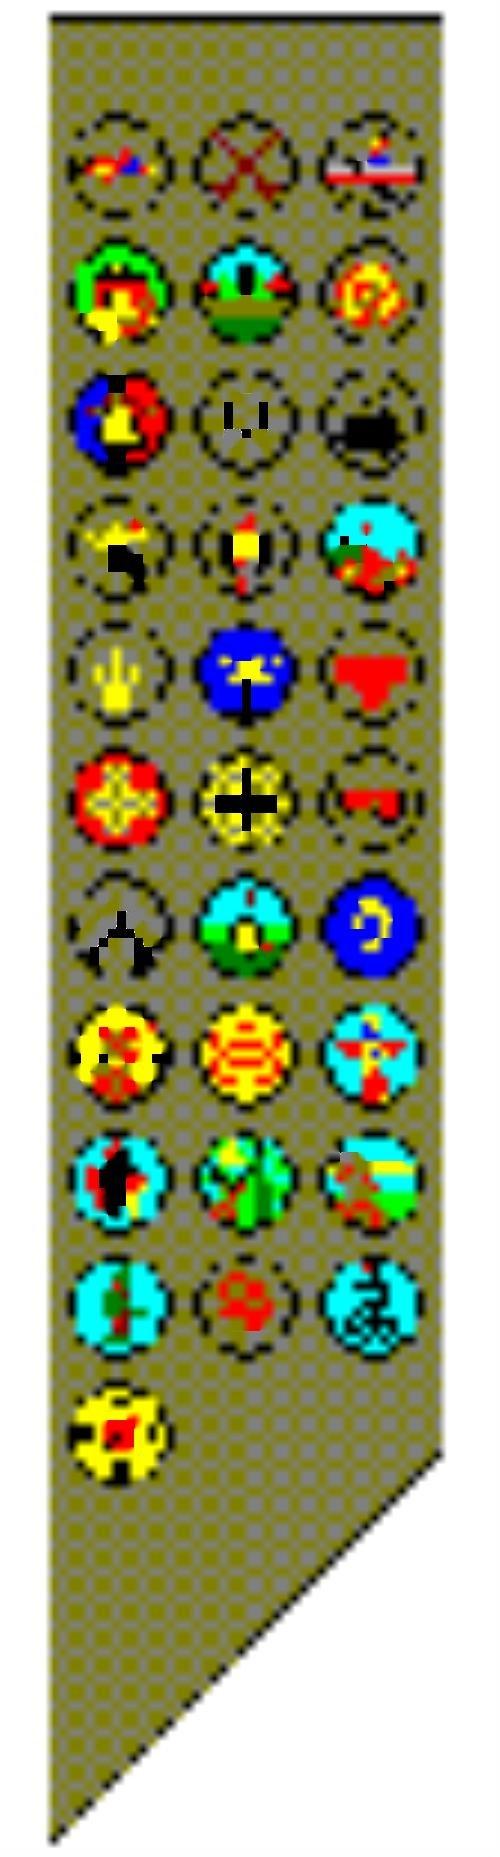 Public Merit Badges  Boy Scout Troop 50 State College Pennsylvania As Well As Chess Merit Badge Worksheet